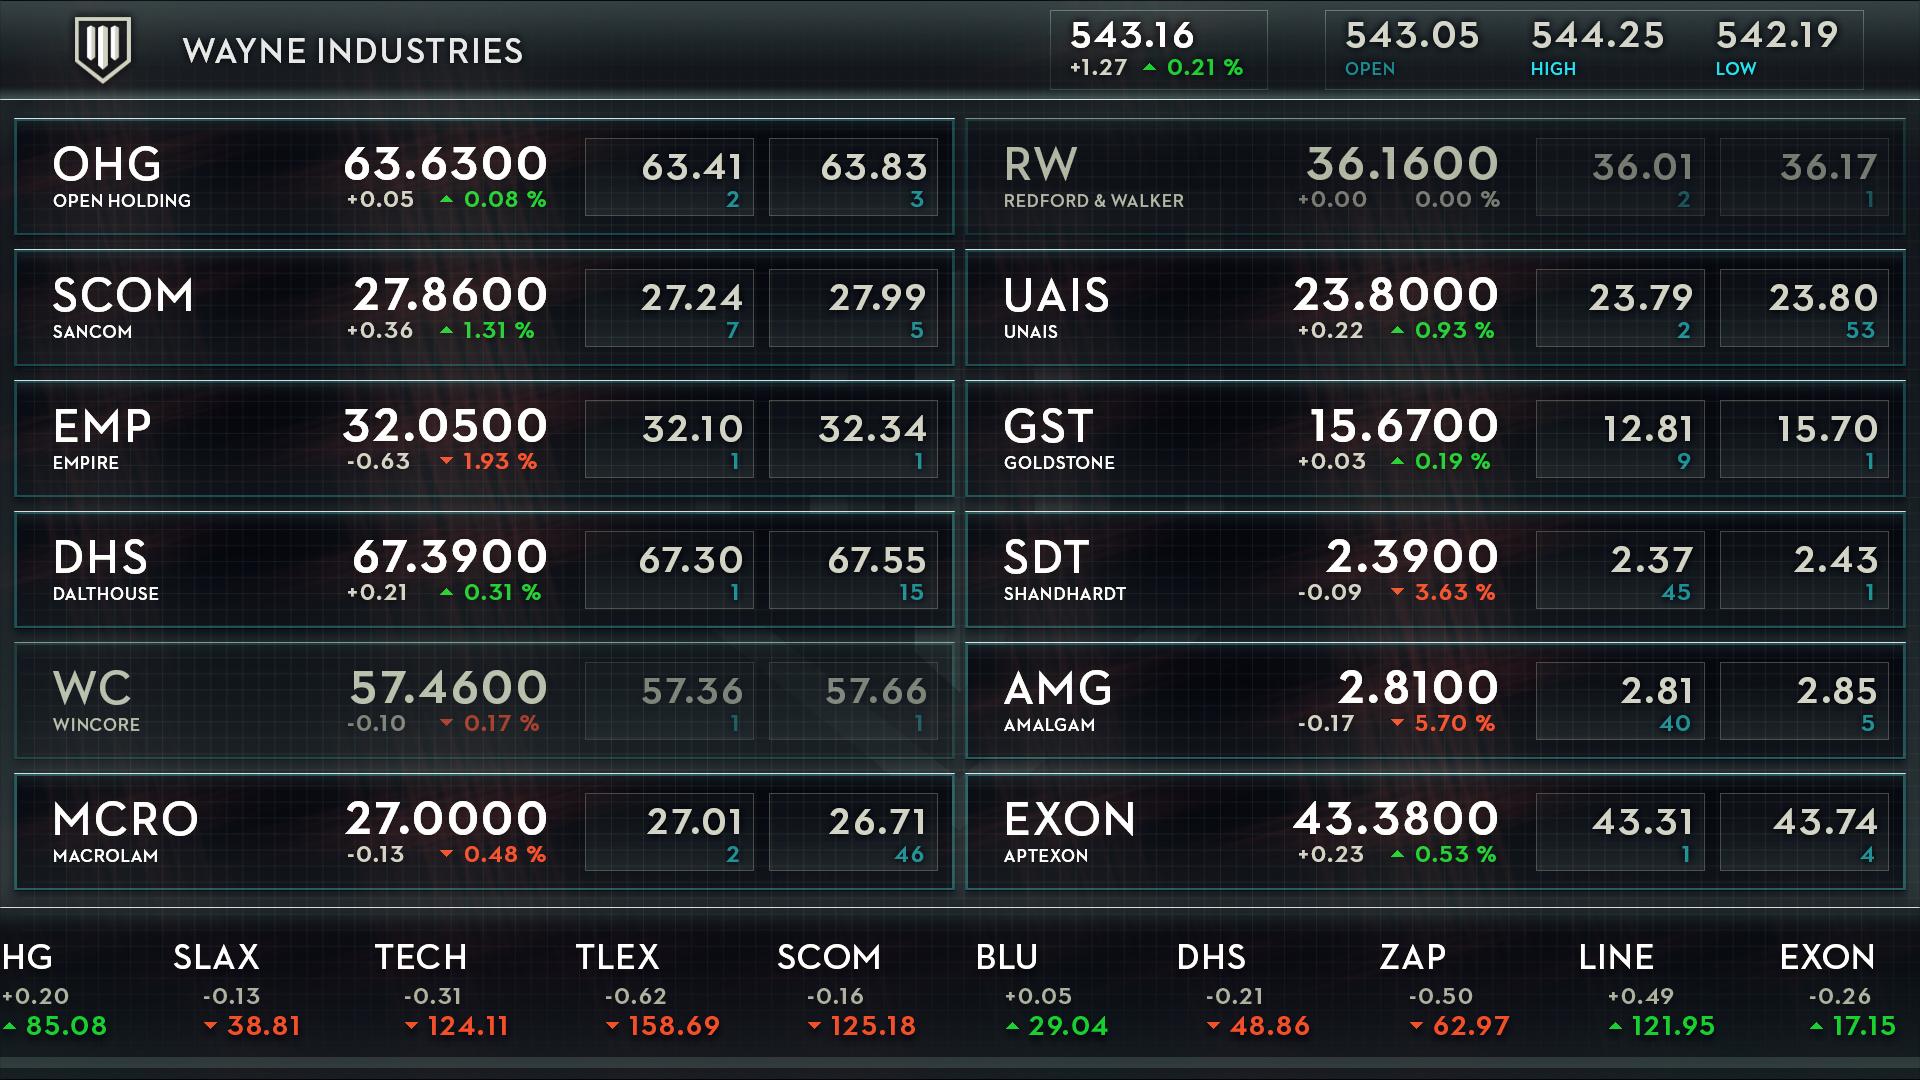 BVS_Wayne_Stocks_1a_mod 2